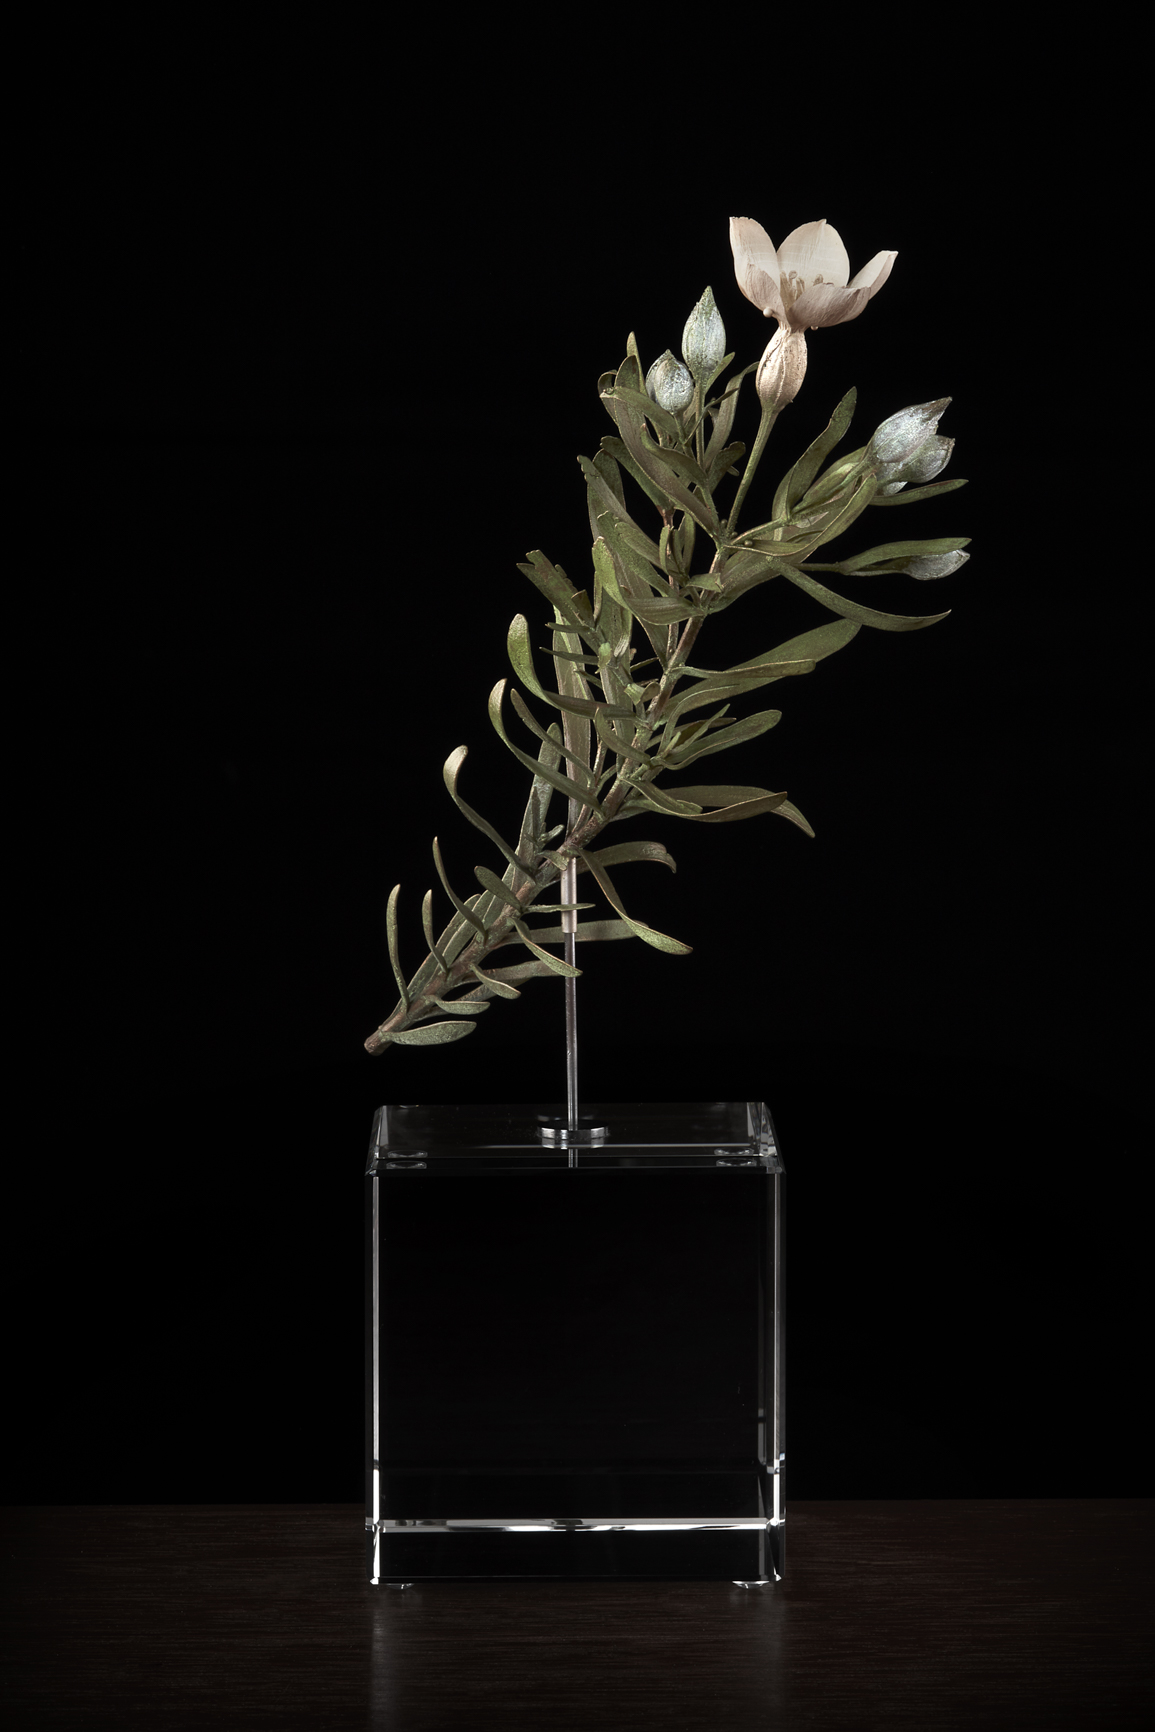 <i> Orphium frutescens </i>